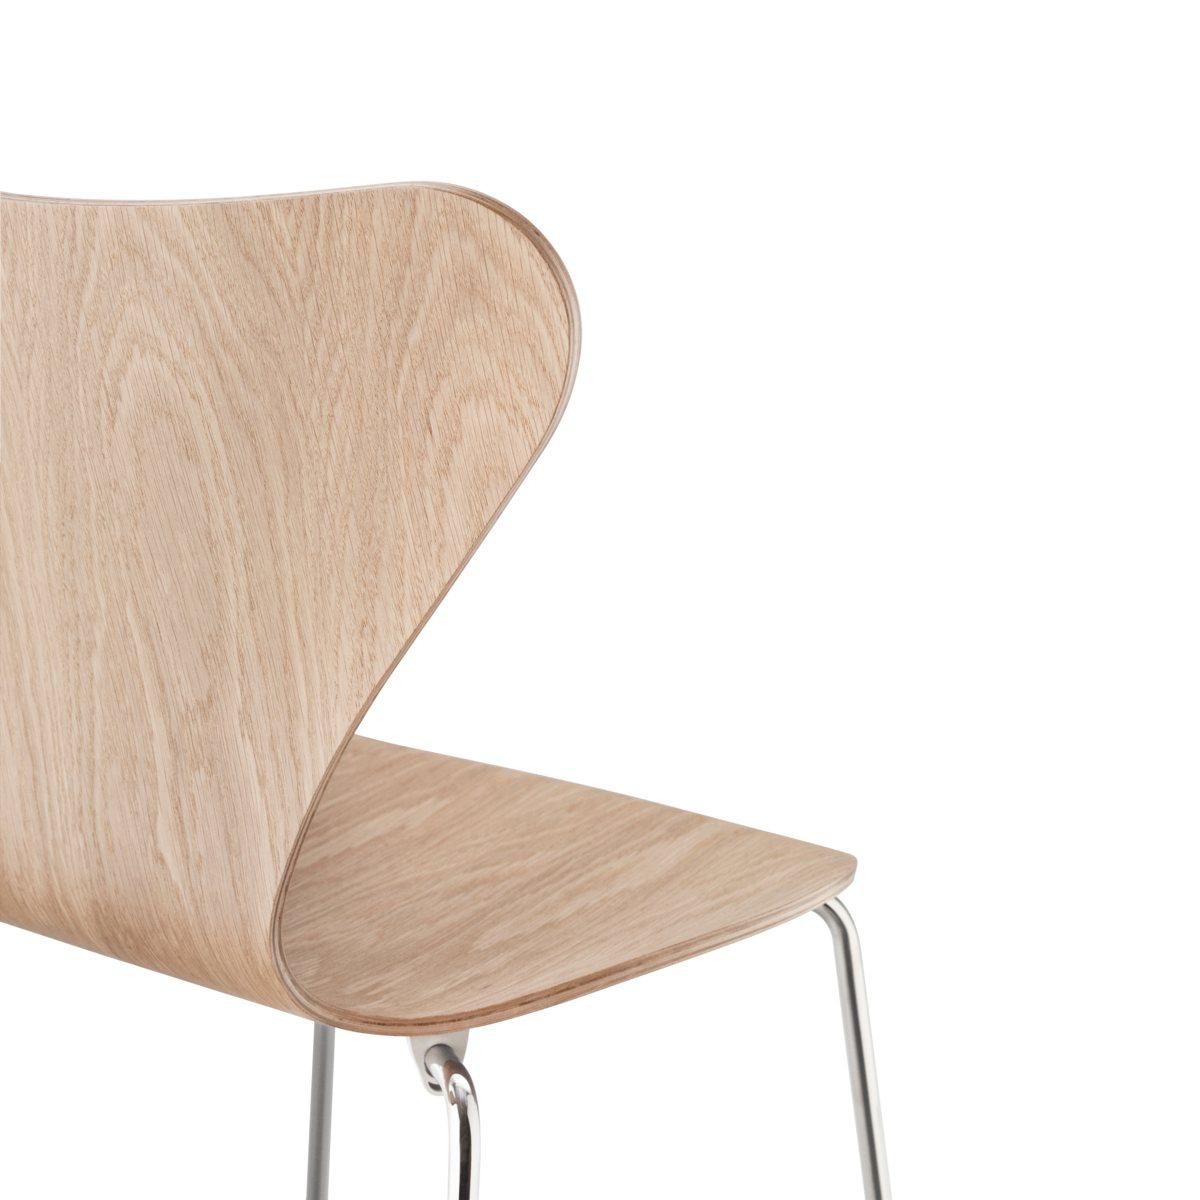 Series 7 chair by arne jacobsen inox black mad for modern - Arne jacobsen stuhl serie 7 ...